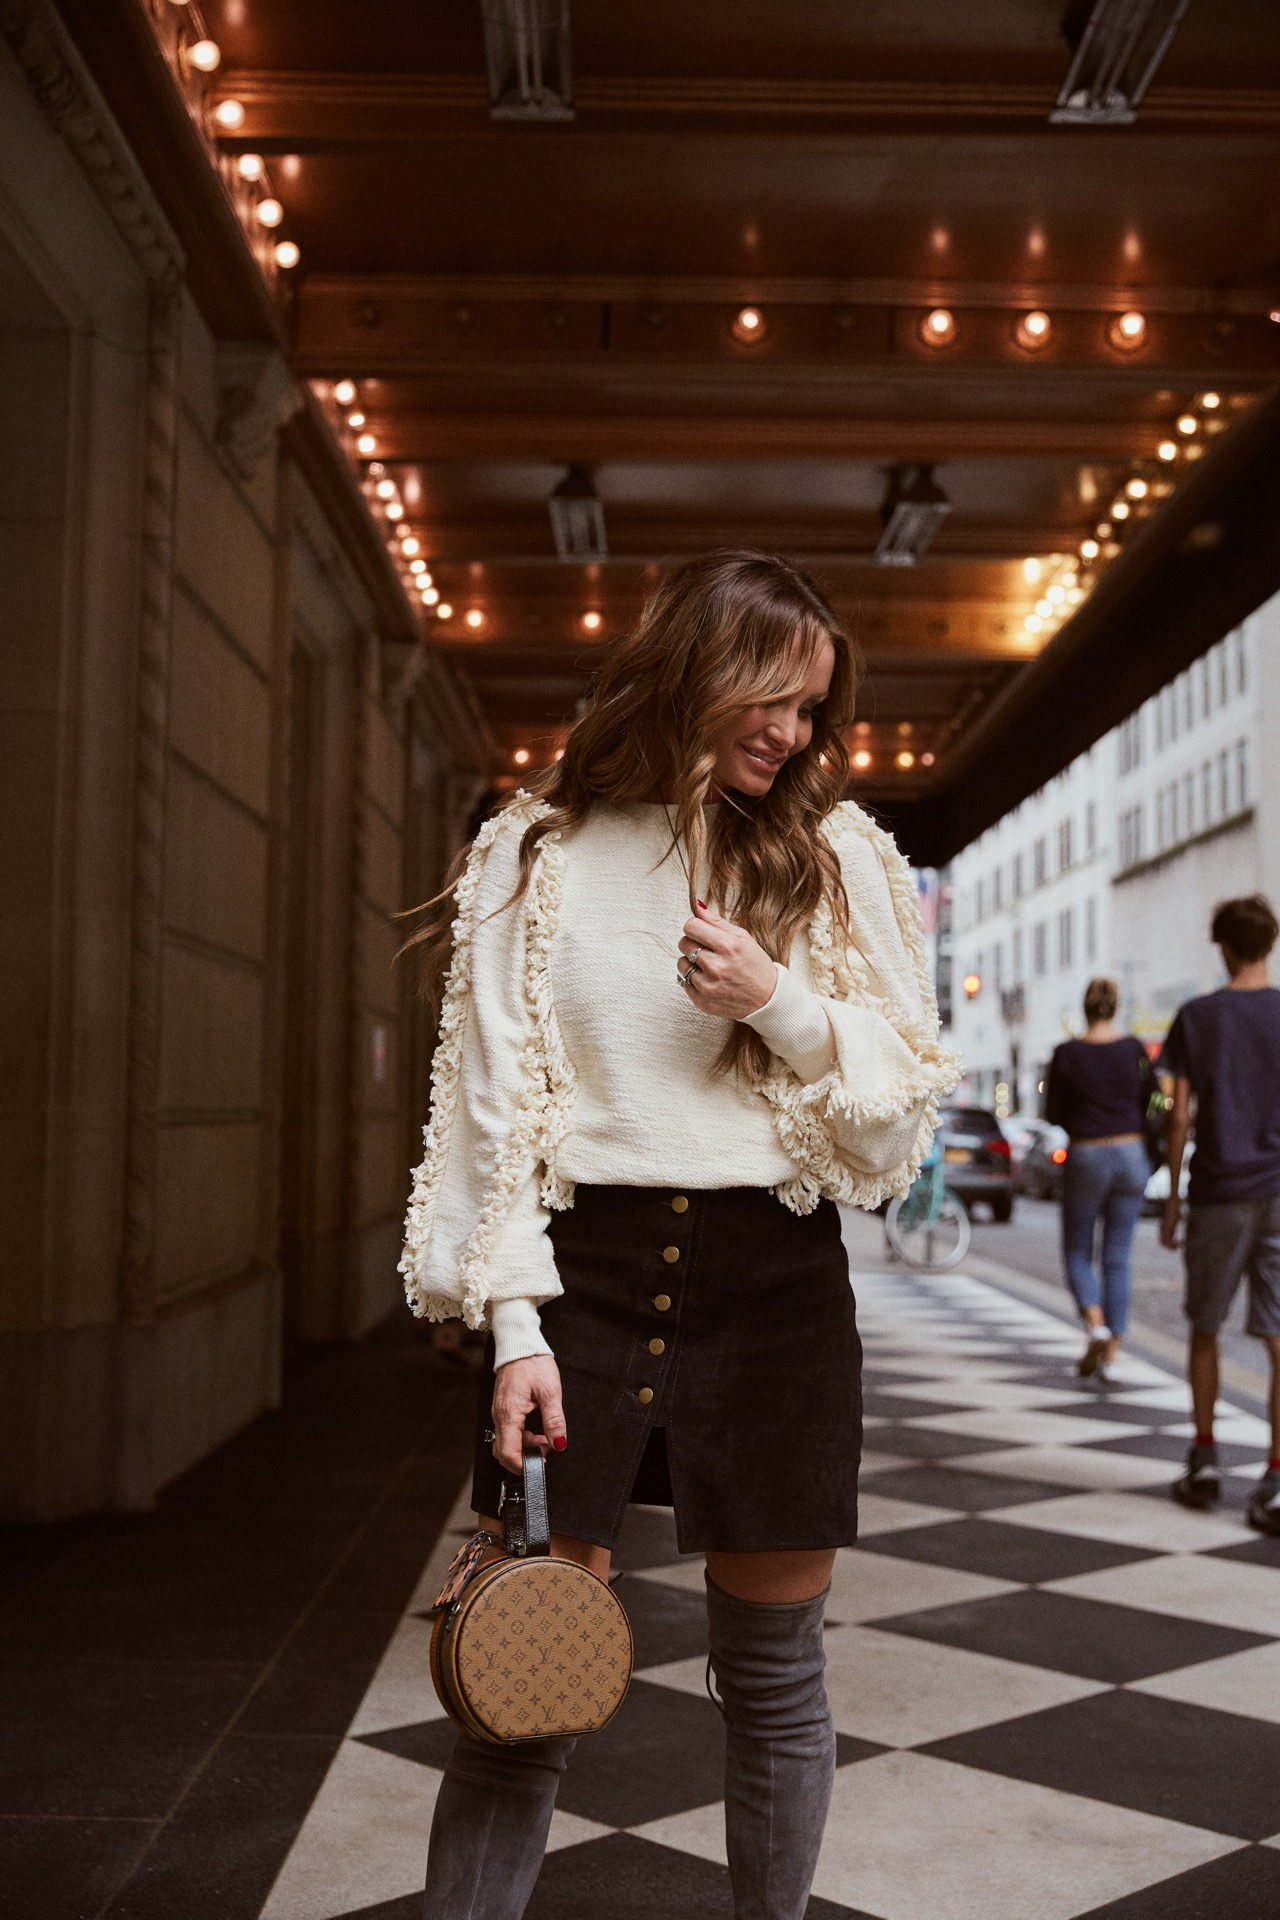 #DKW-Fashion Good Sweater & Thigh Highs